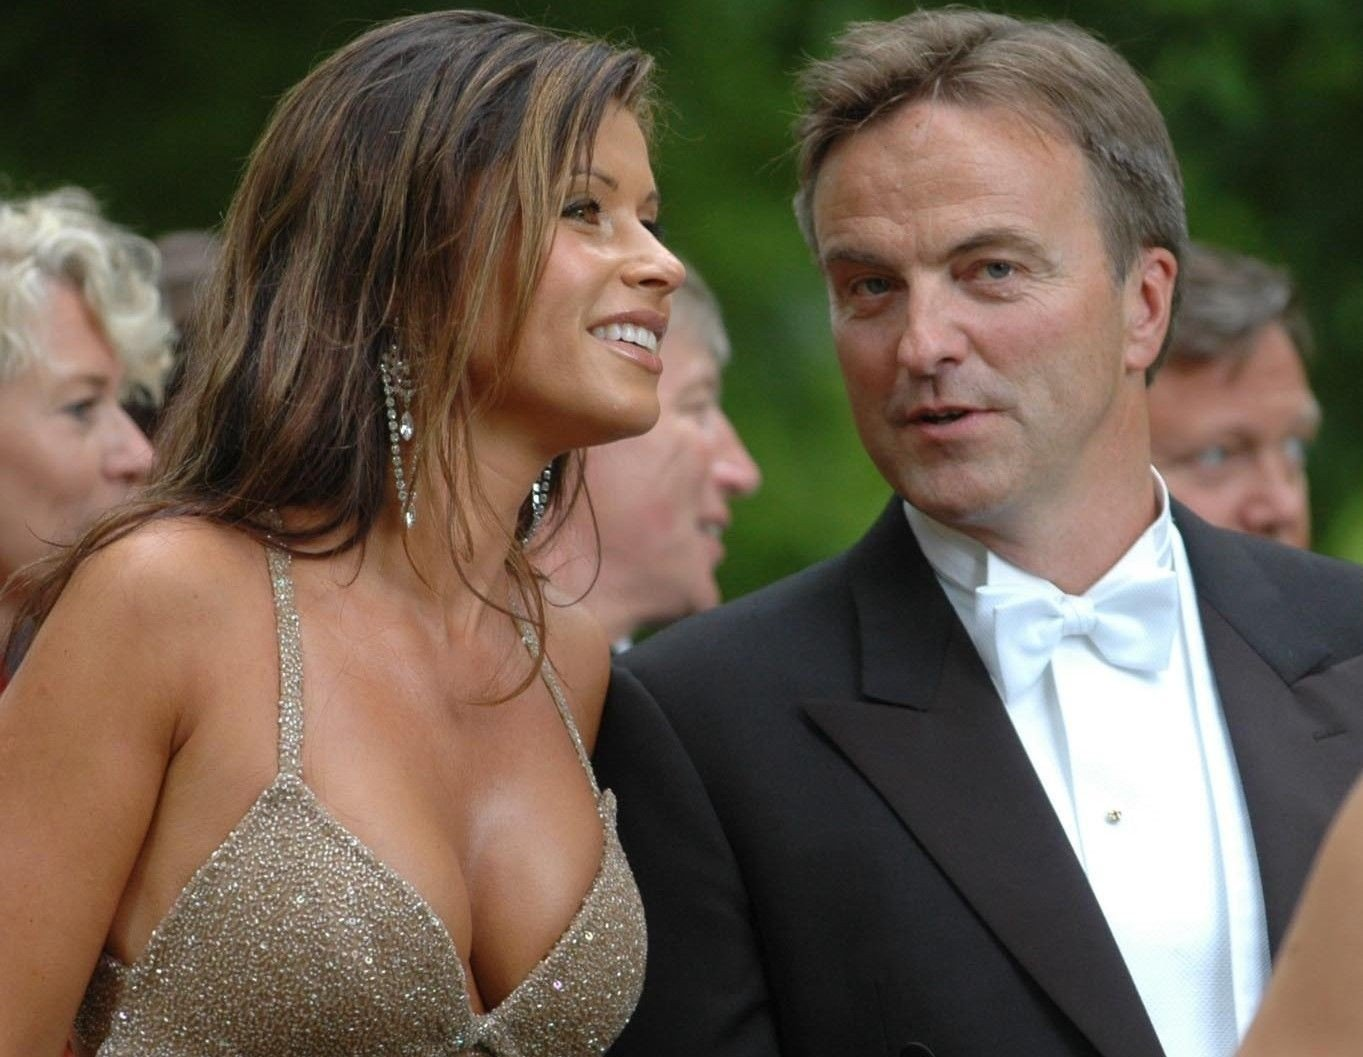 Arkivbilde: Ola Mæle og kona Vibeke Tveit som bryllupsgjester i Larvik 2004.